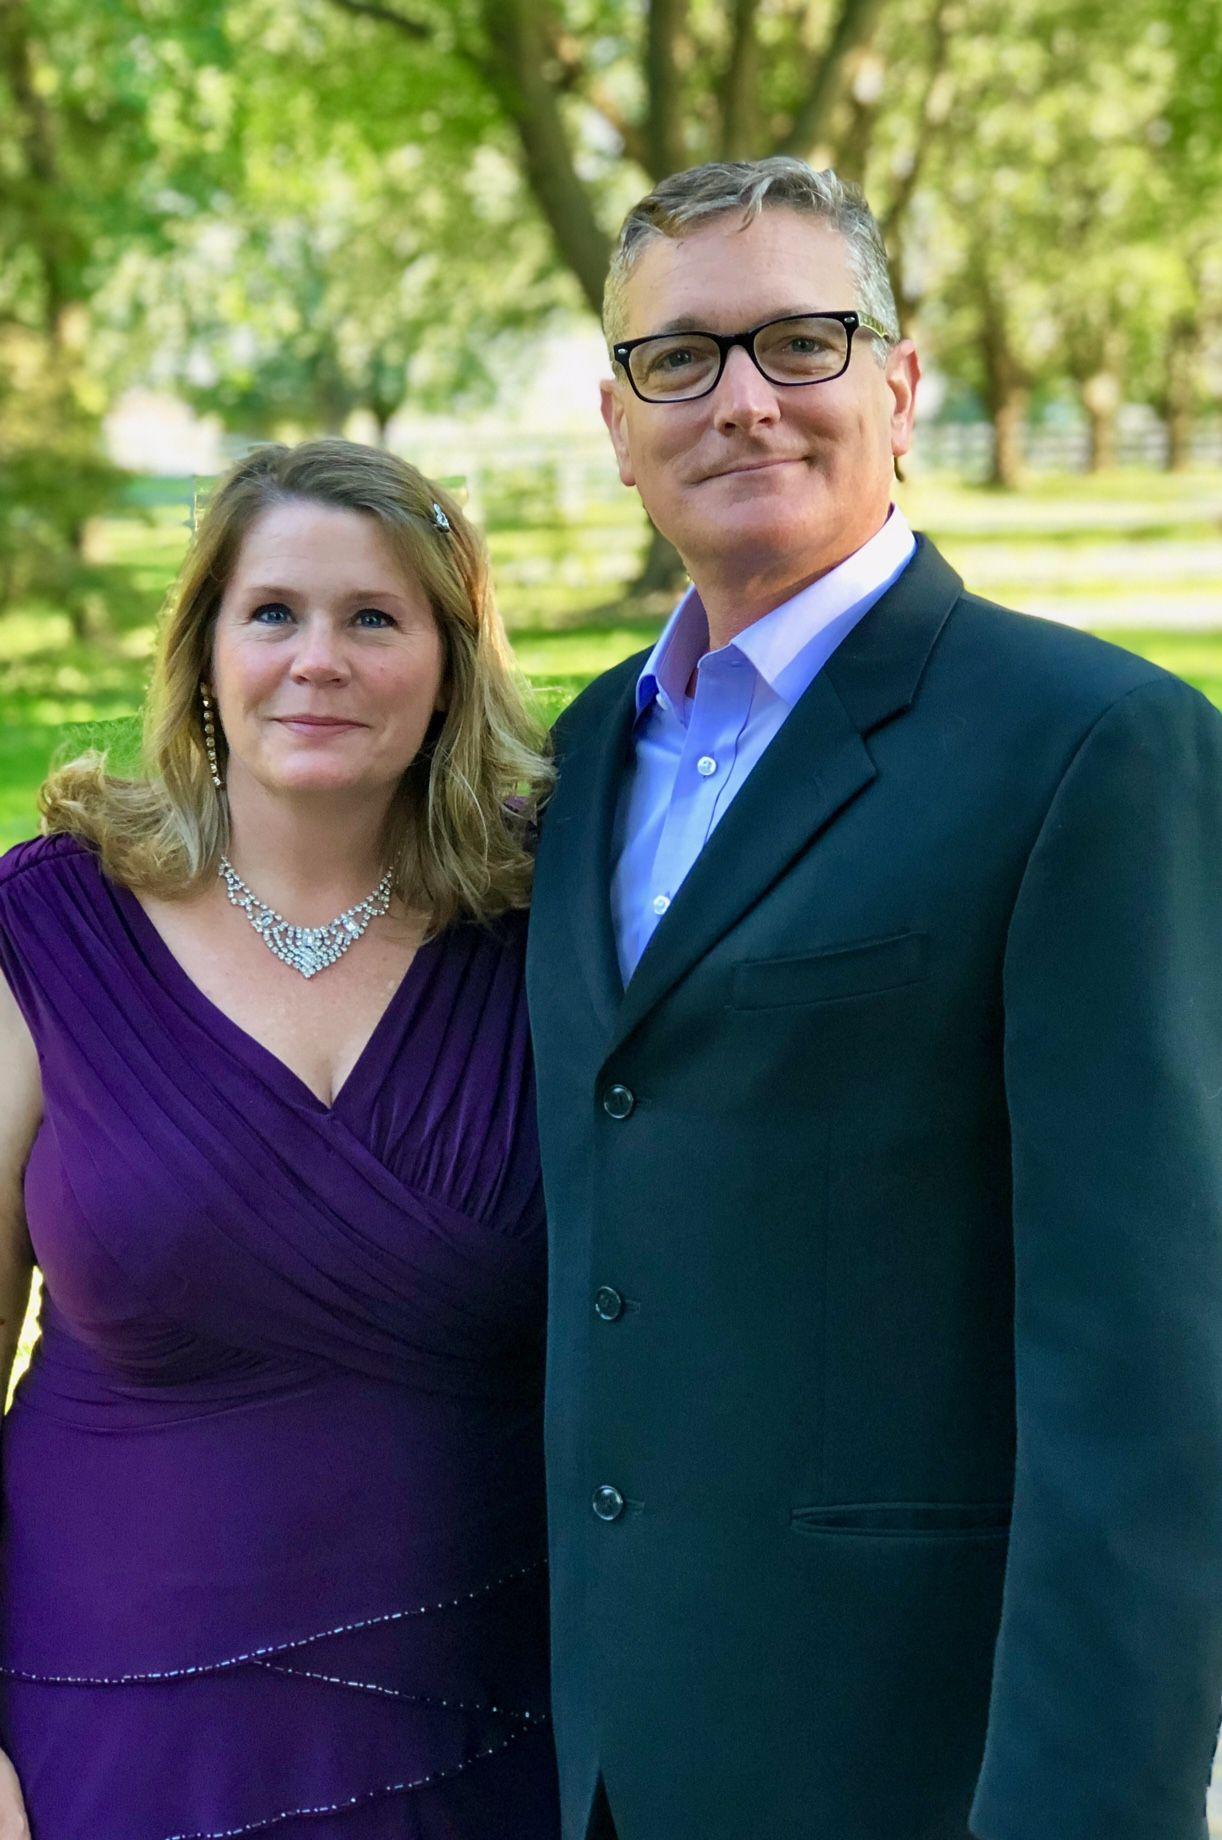 Scott and Wendy Schumacher, at age 47, married 26 yrs, 3